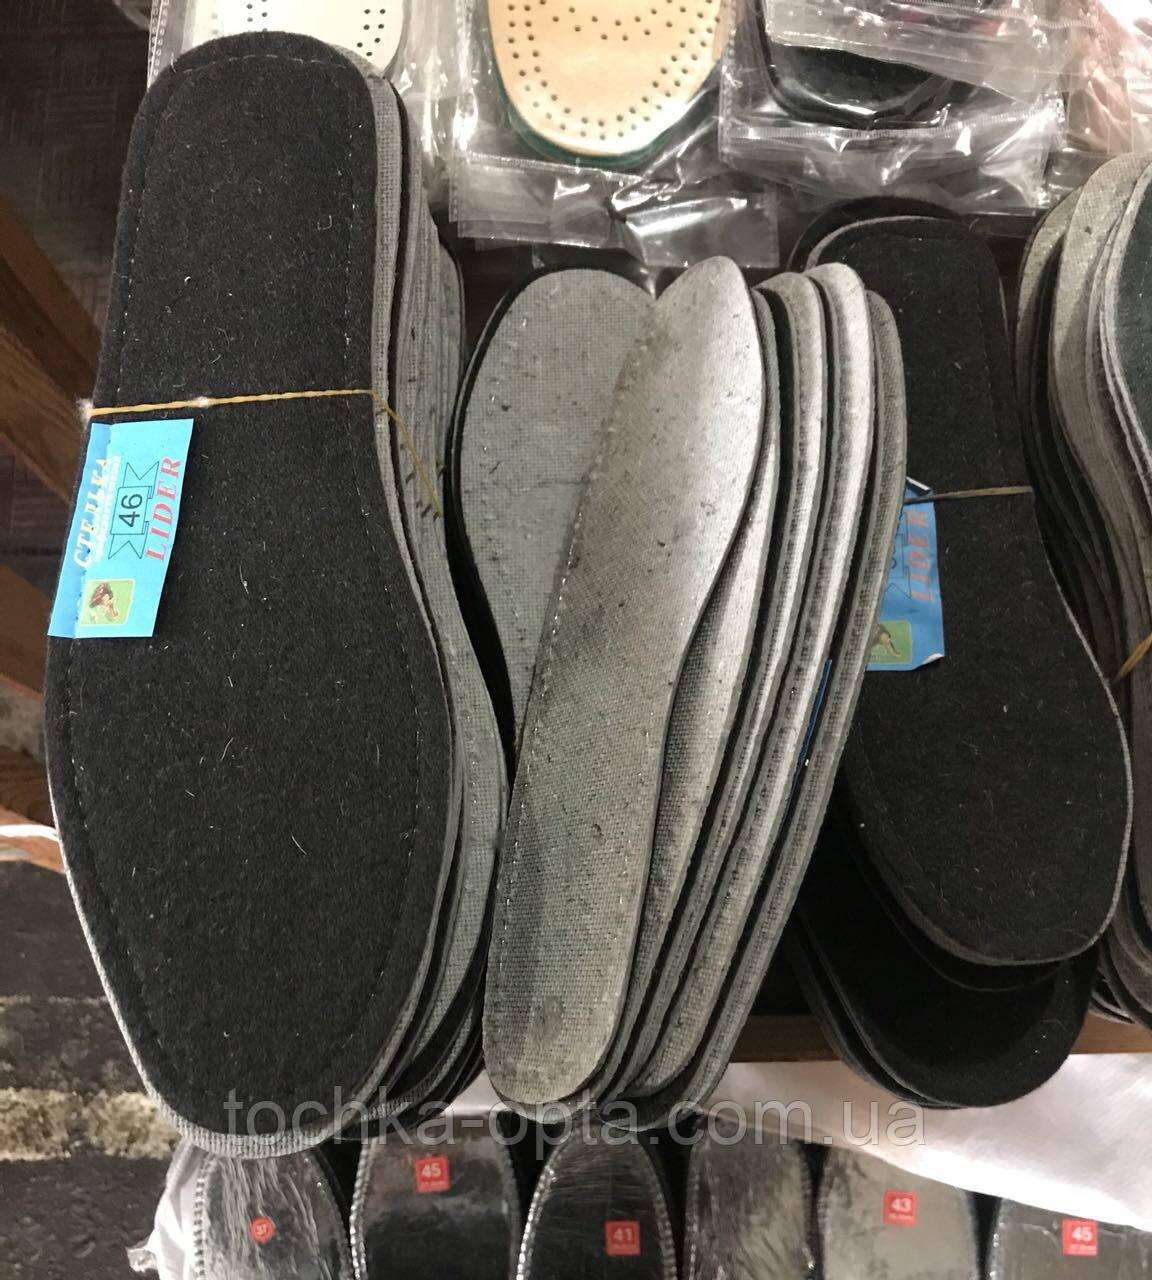 Стелька для обуви байка на кожкартоне 41